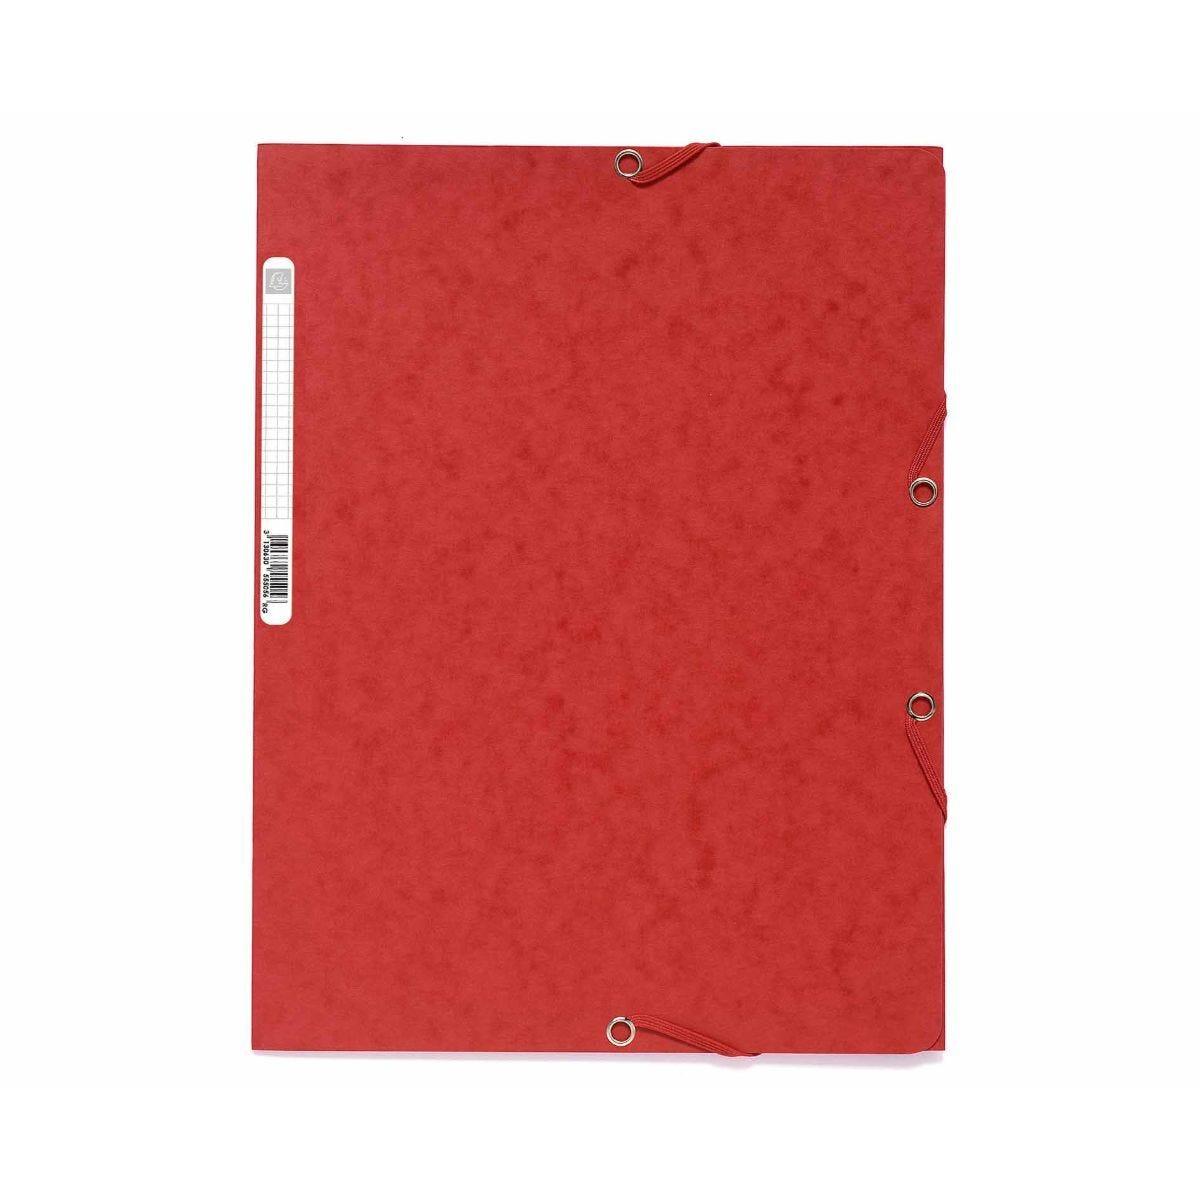 Exacompta Europa Elastic 3 Flap Folder A4 Pack of 25 Red